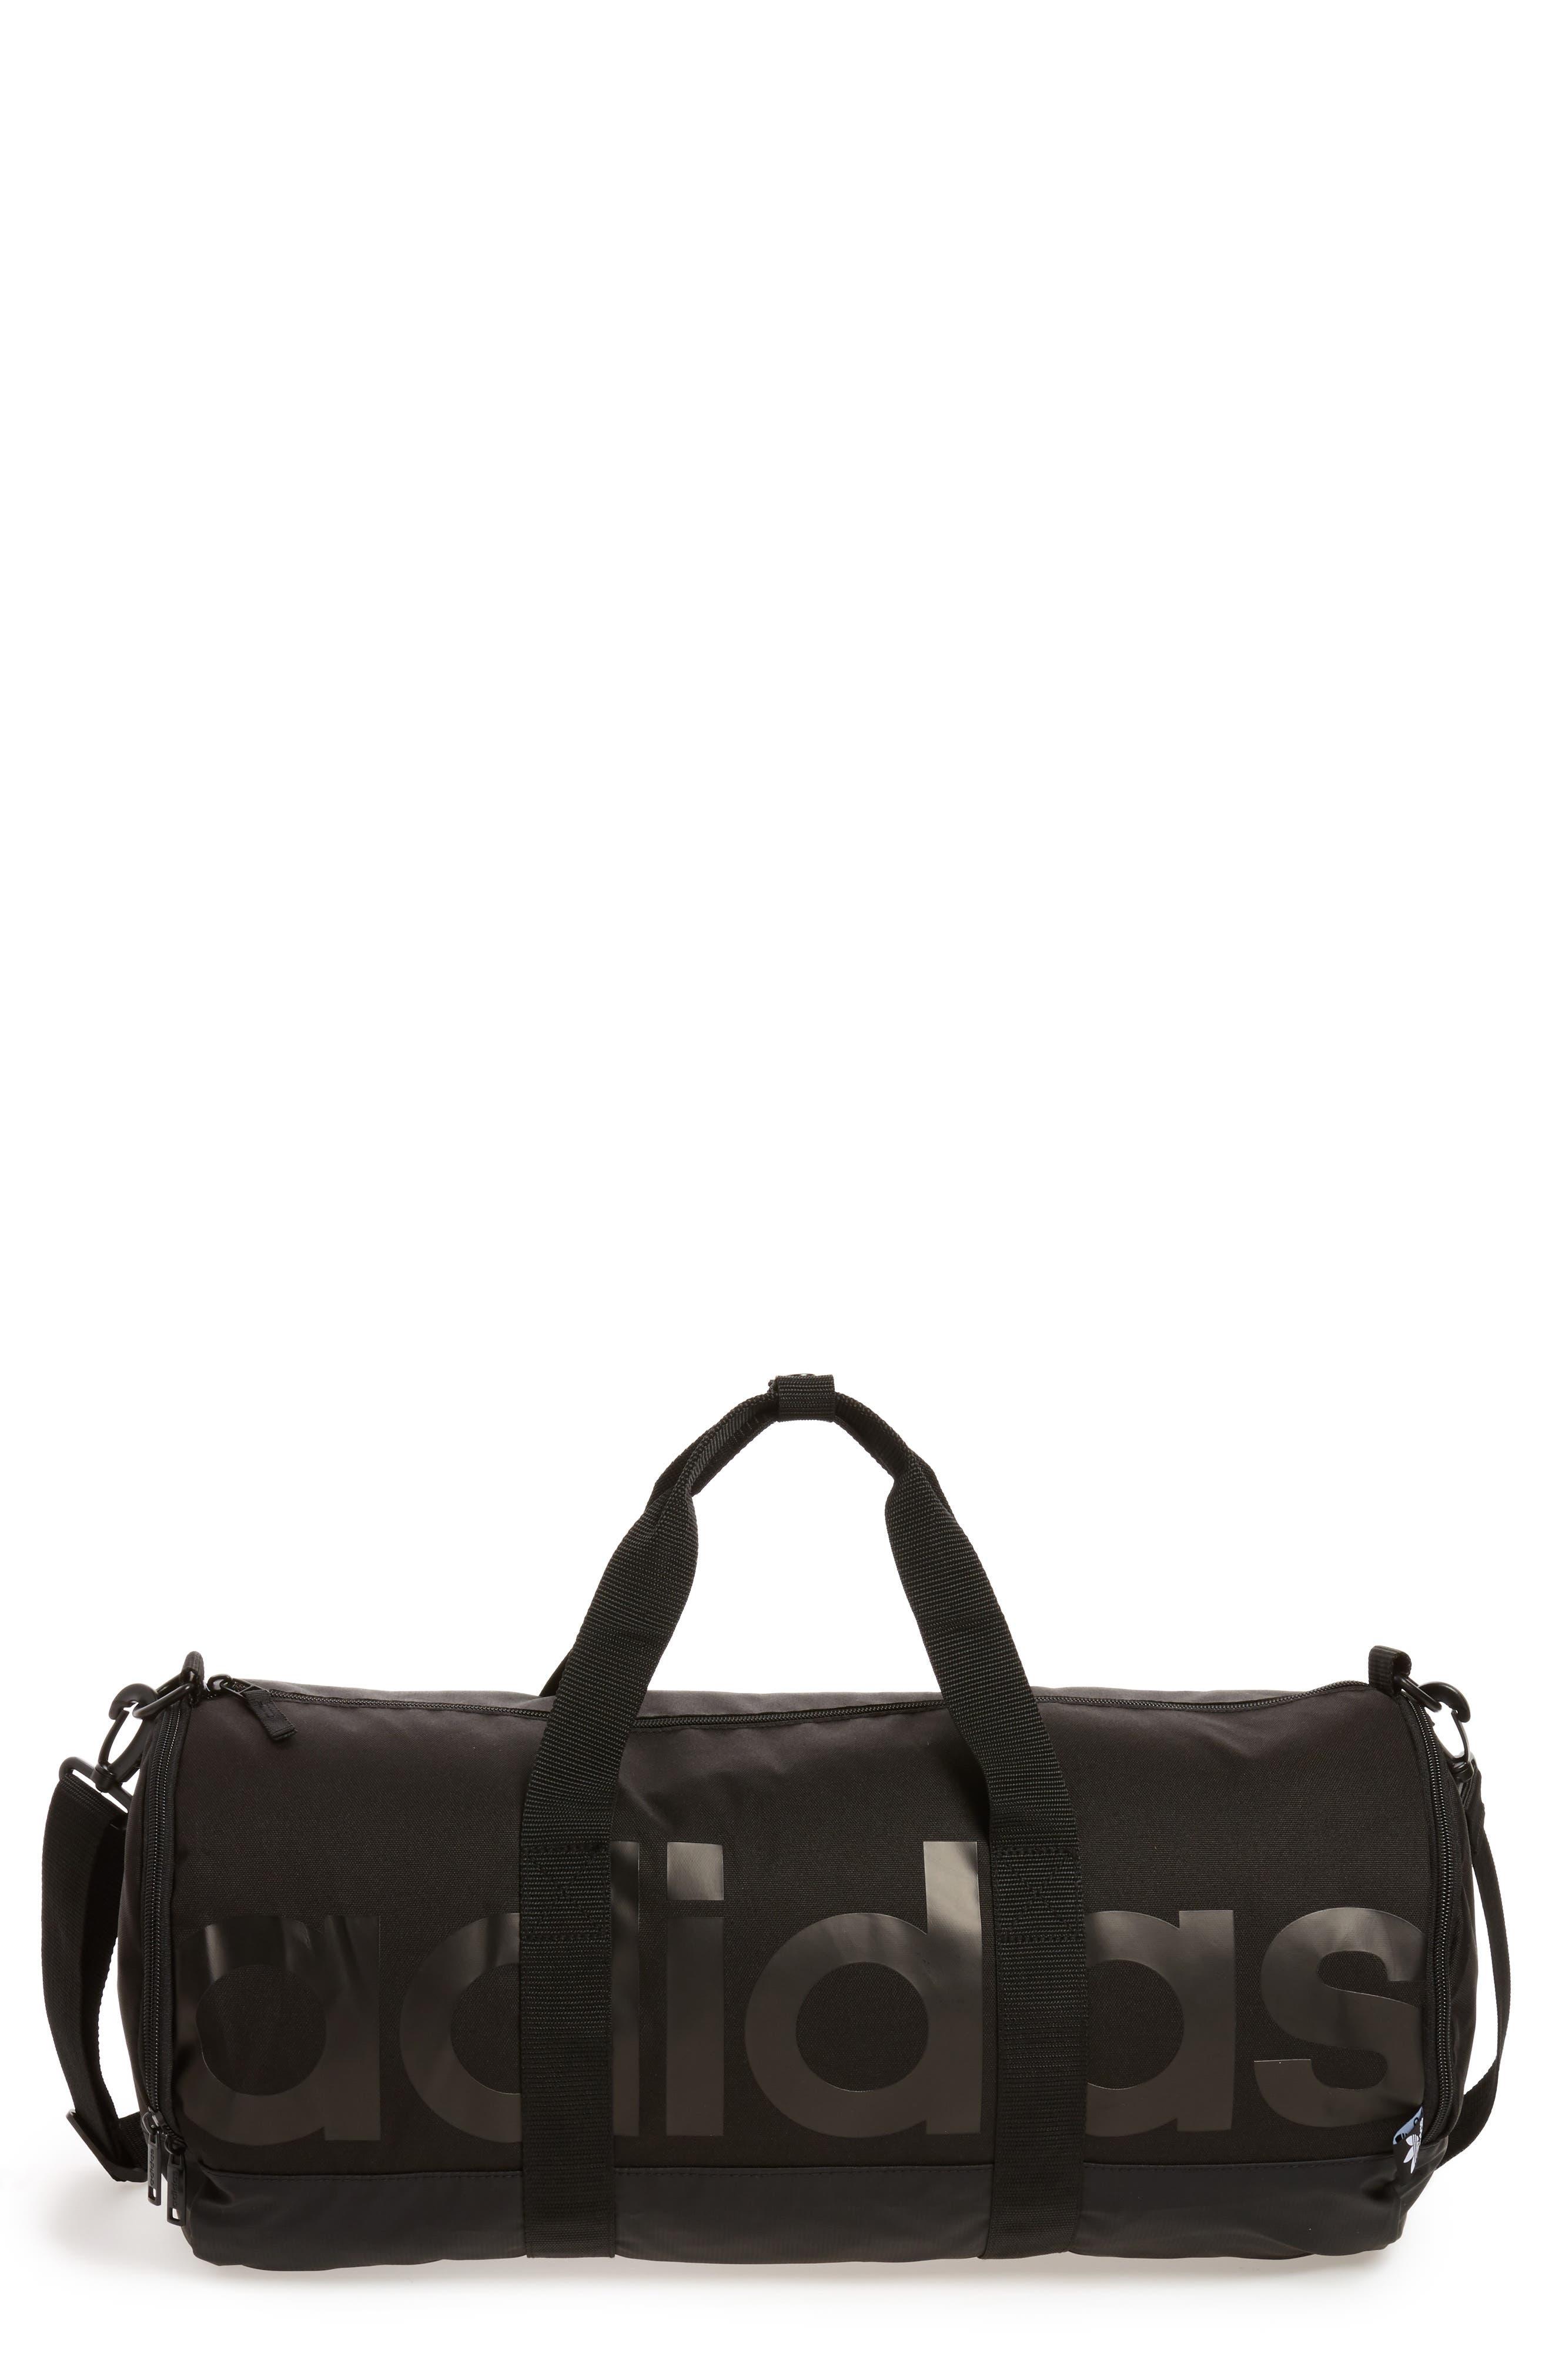 Main Image - adidas Originals Santiago Duffel Bag